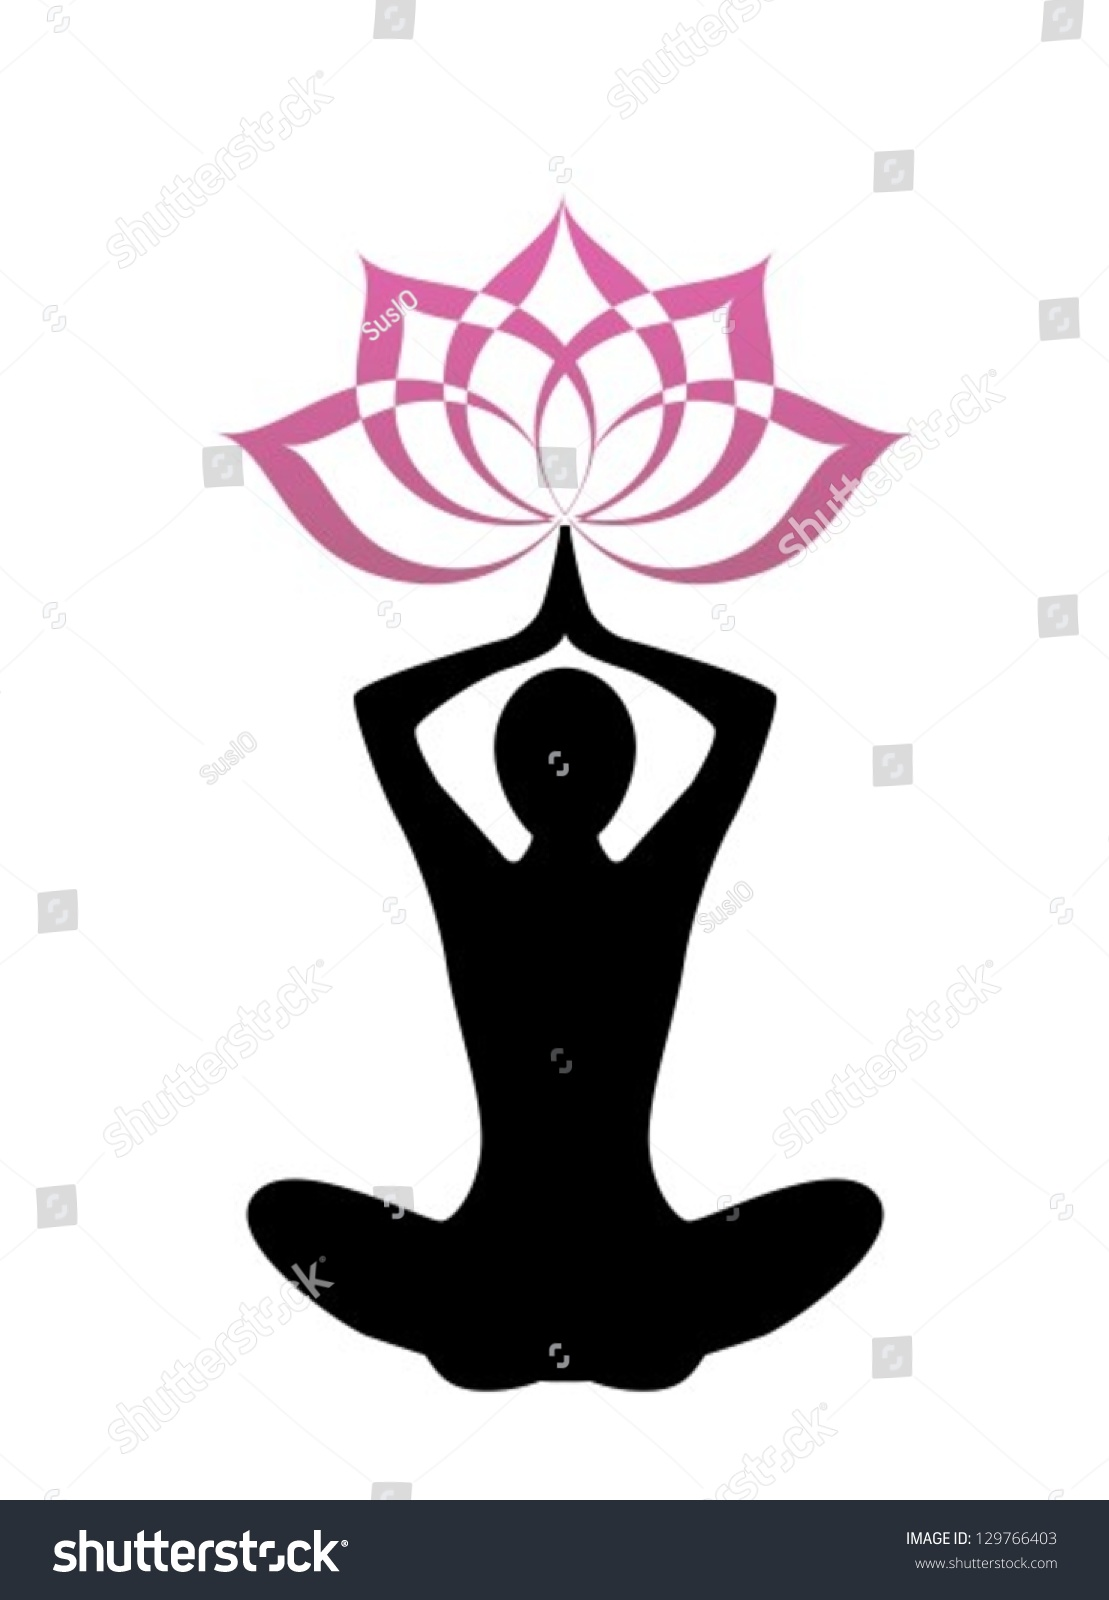 Female Silhouette Yoga Above Her Head A Lotus Flower Ez Canvas